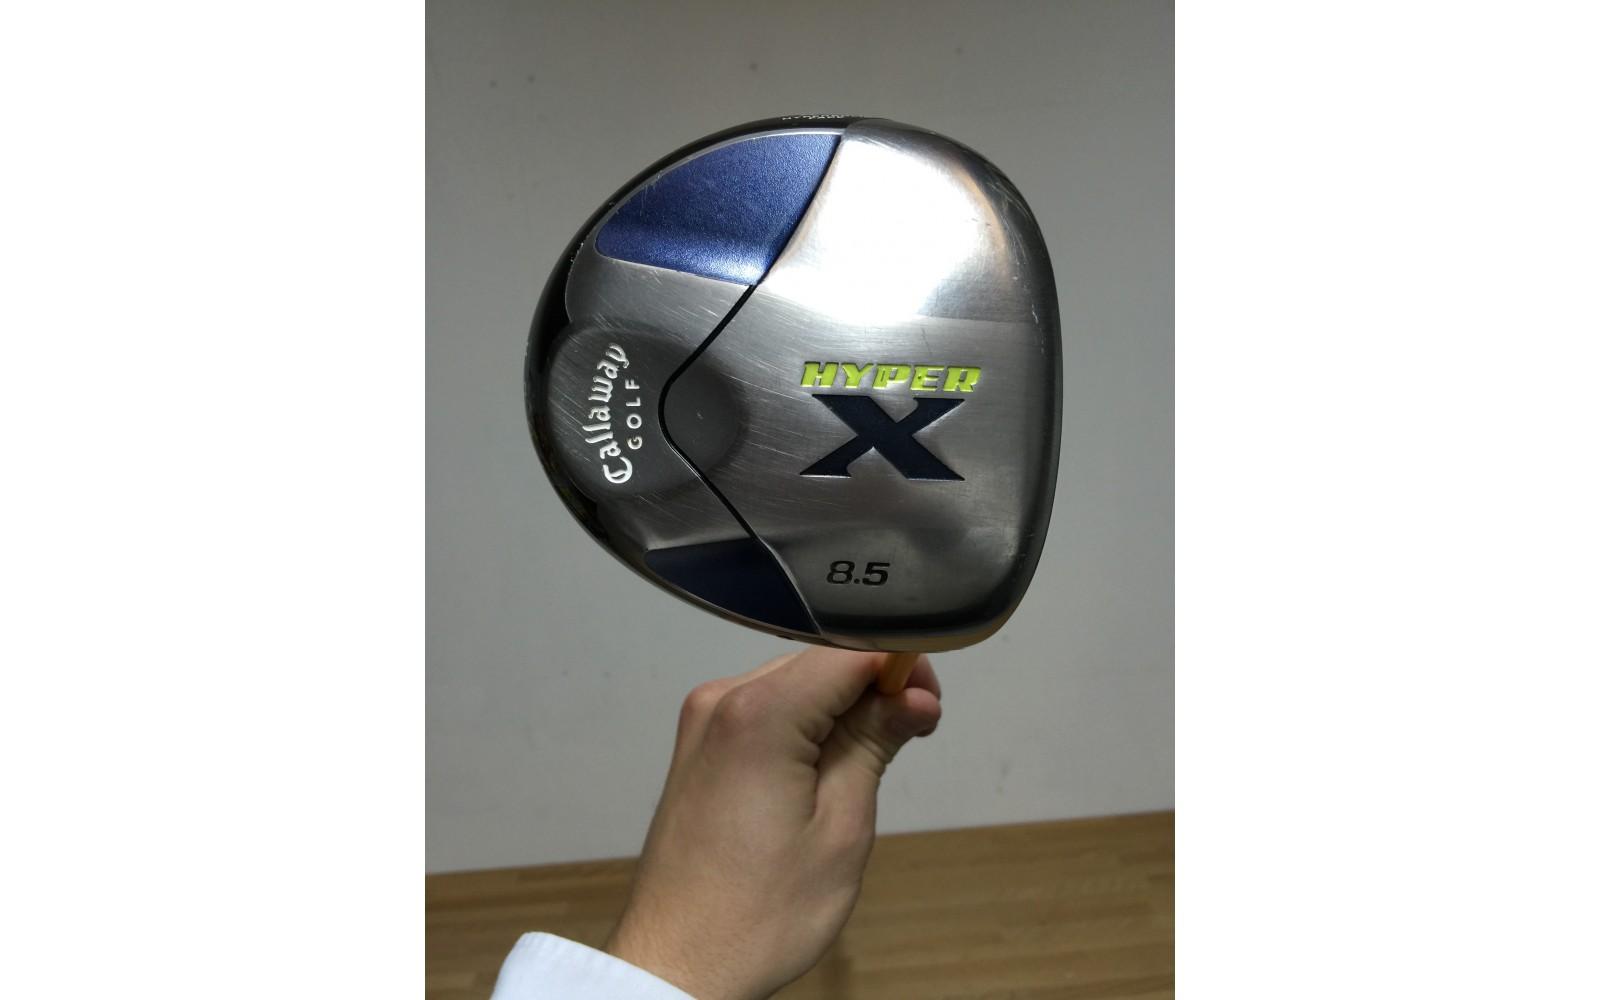 Callaway Hyper X 8.5° Driver